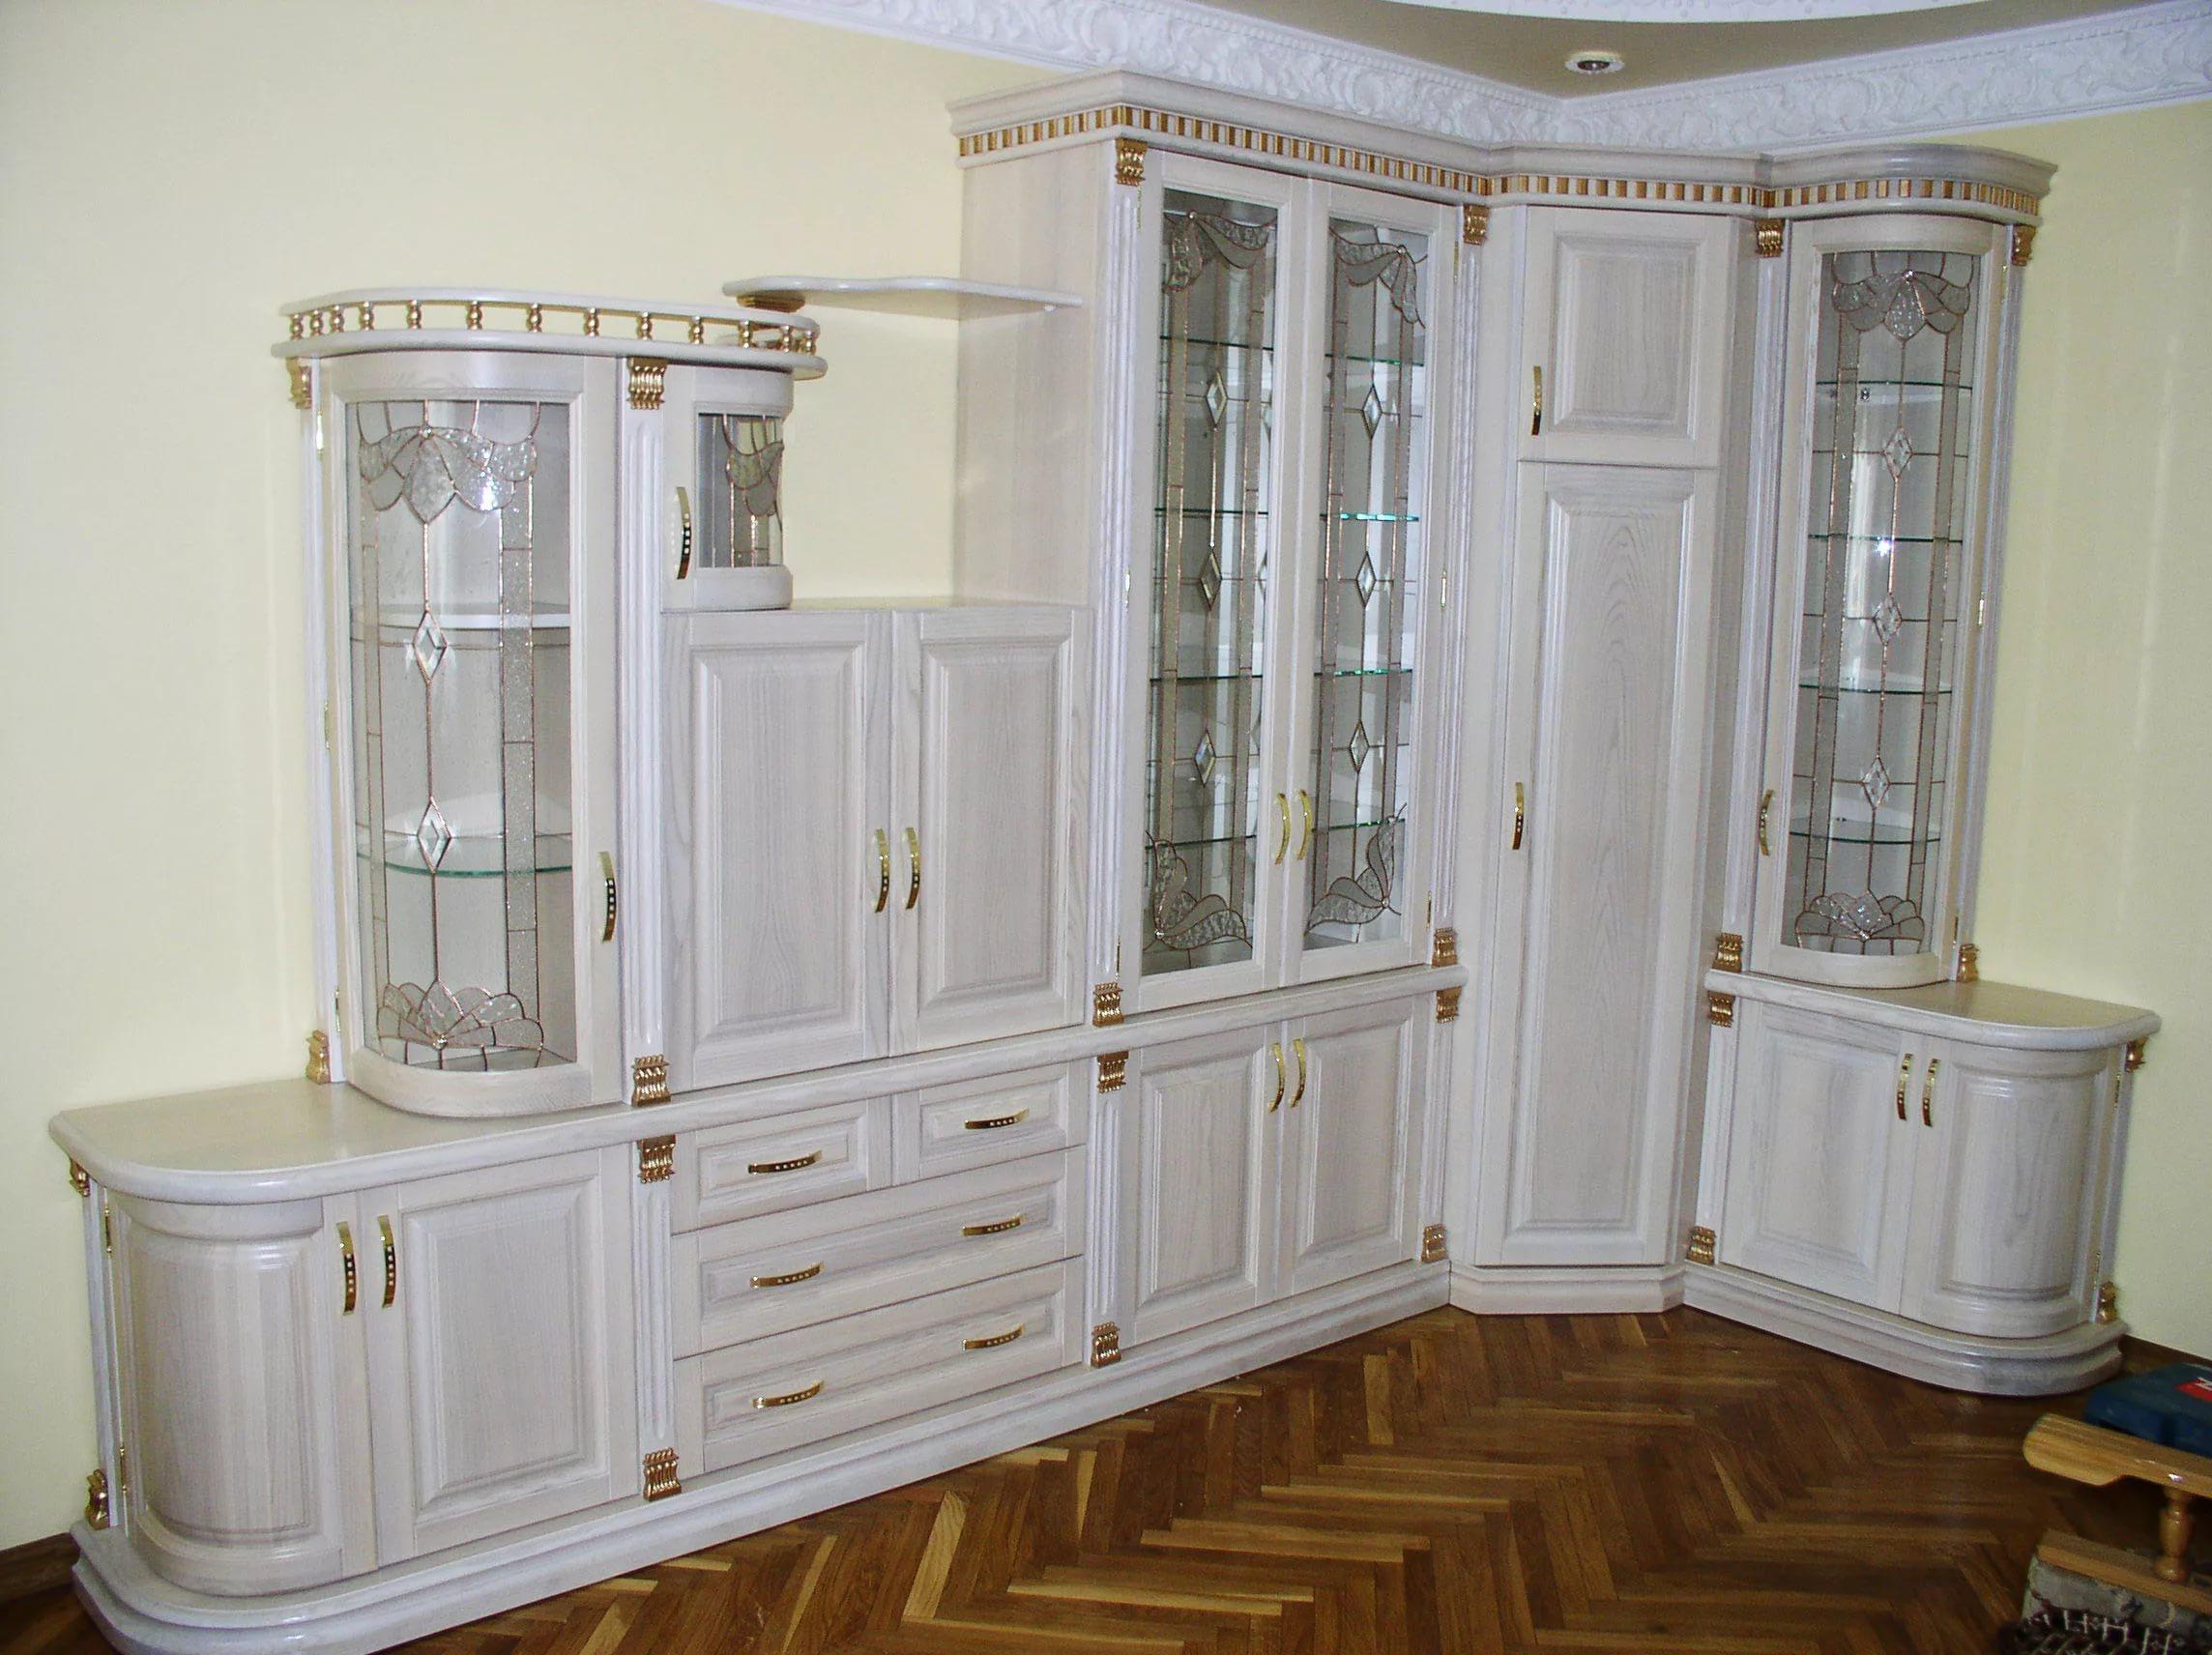 Sideboard Untuk Hidangan Di Ruang Tamu 42 Gambar Model Dengan Pameran Dalam Gaya Klasik Sudut Putih Moden Bufet Kayu